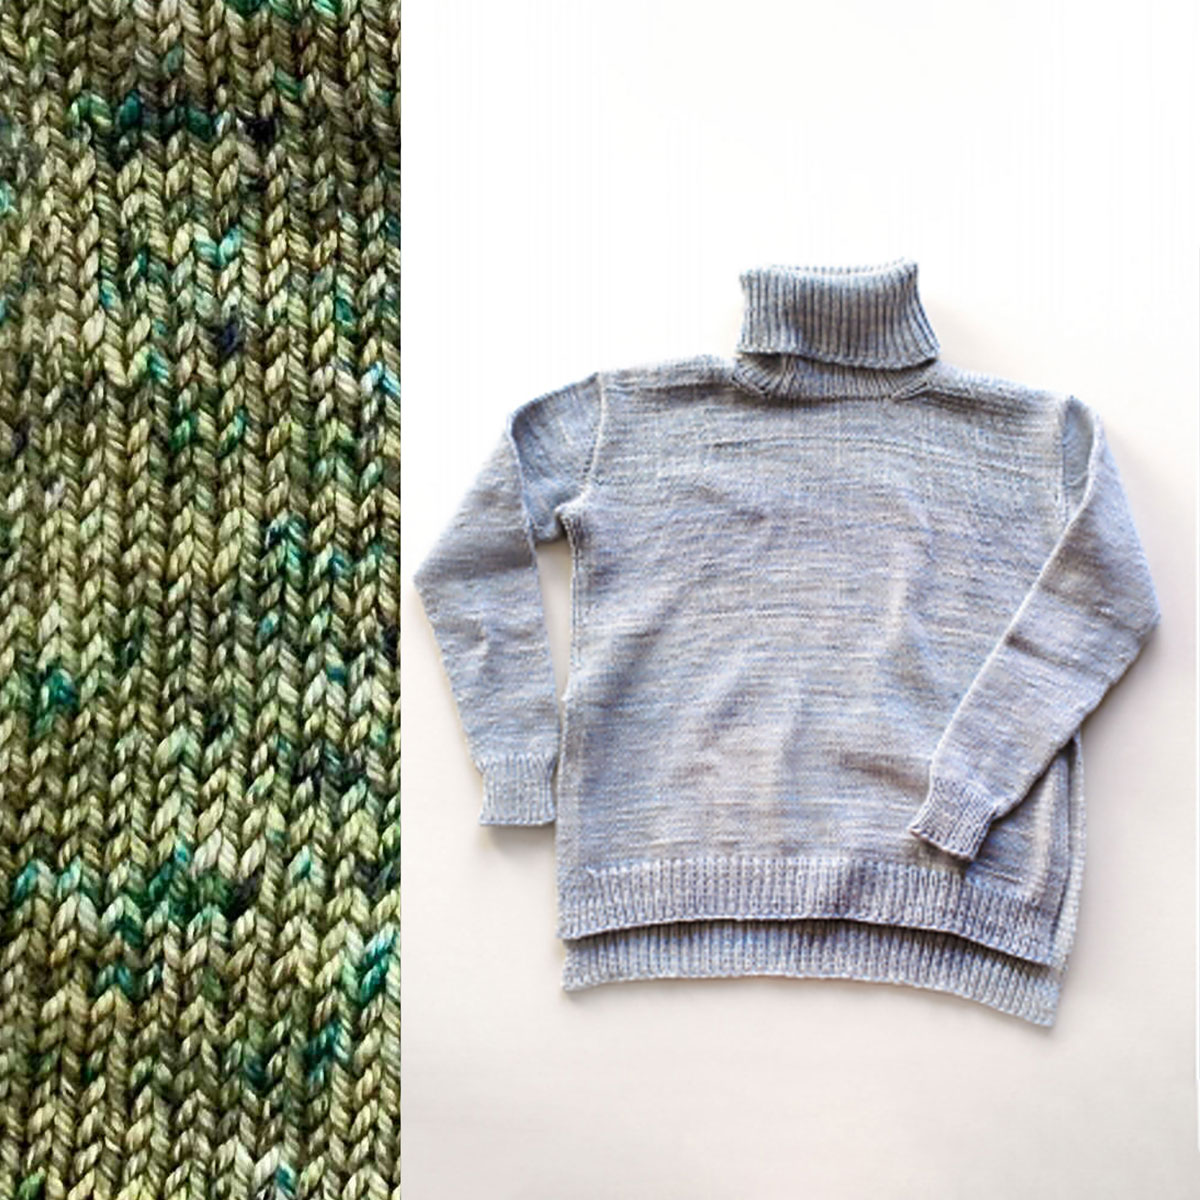 Madelinetosh Sweater Club - Olive You